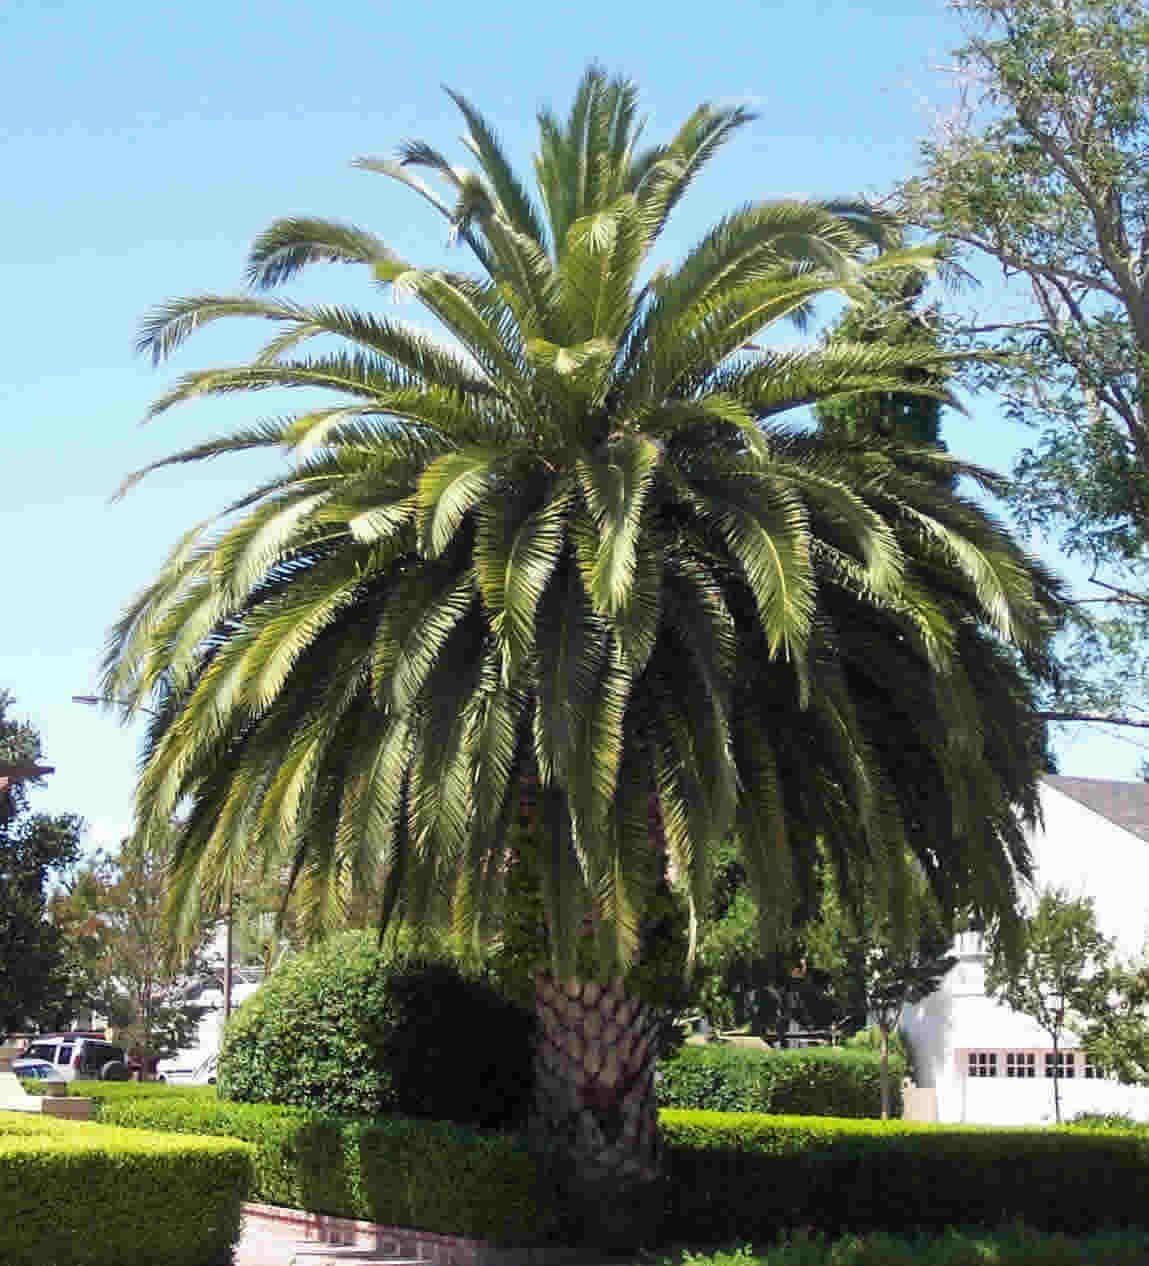 Types Of Palm Trees Palm Tree Identification Palm Tree